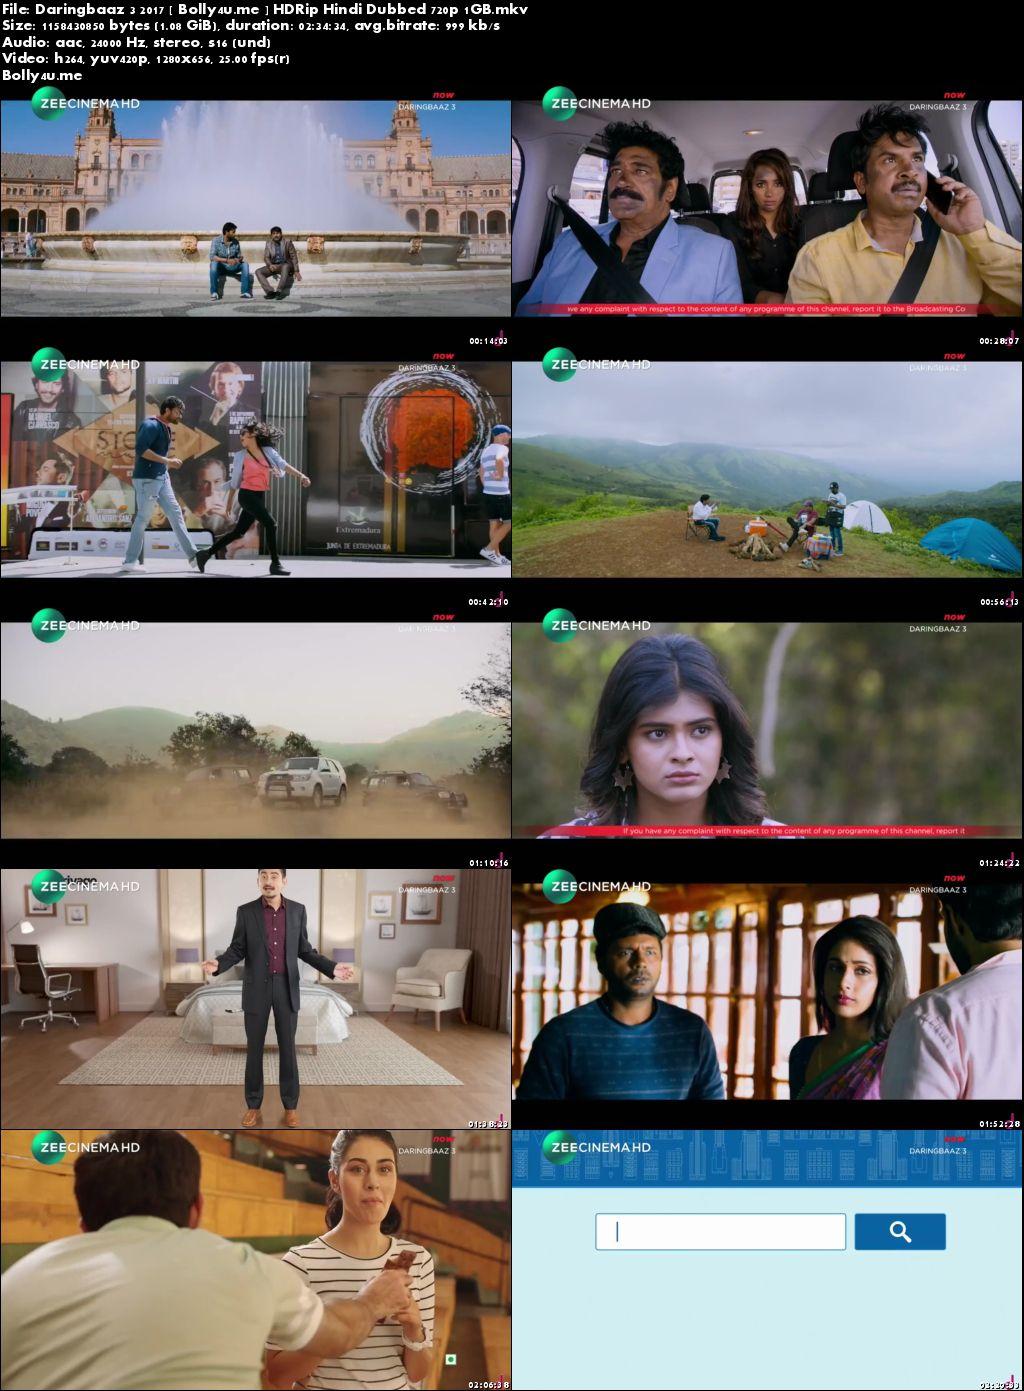 Daringbaaz 3 2017 DTHRip 450MB Hindi Dubbed 480p Download